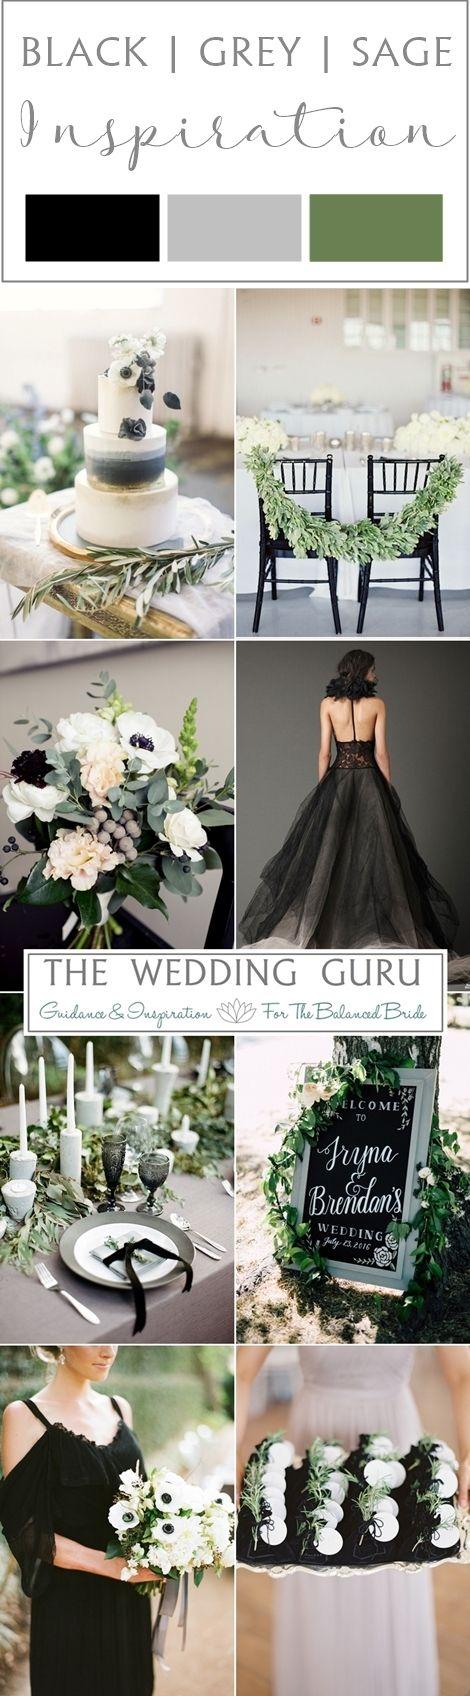 Wedding Inspiration Black Grey Sage Wedding Pinterest